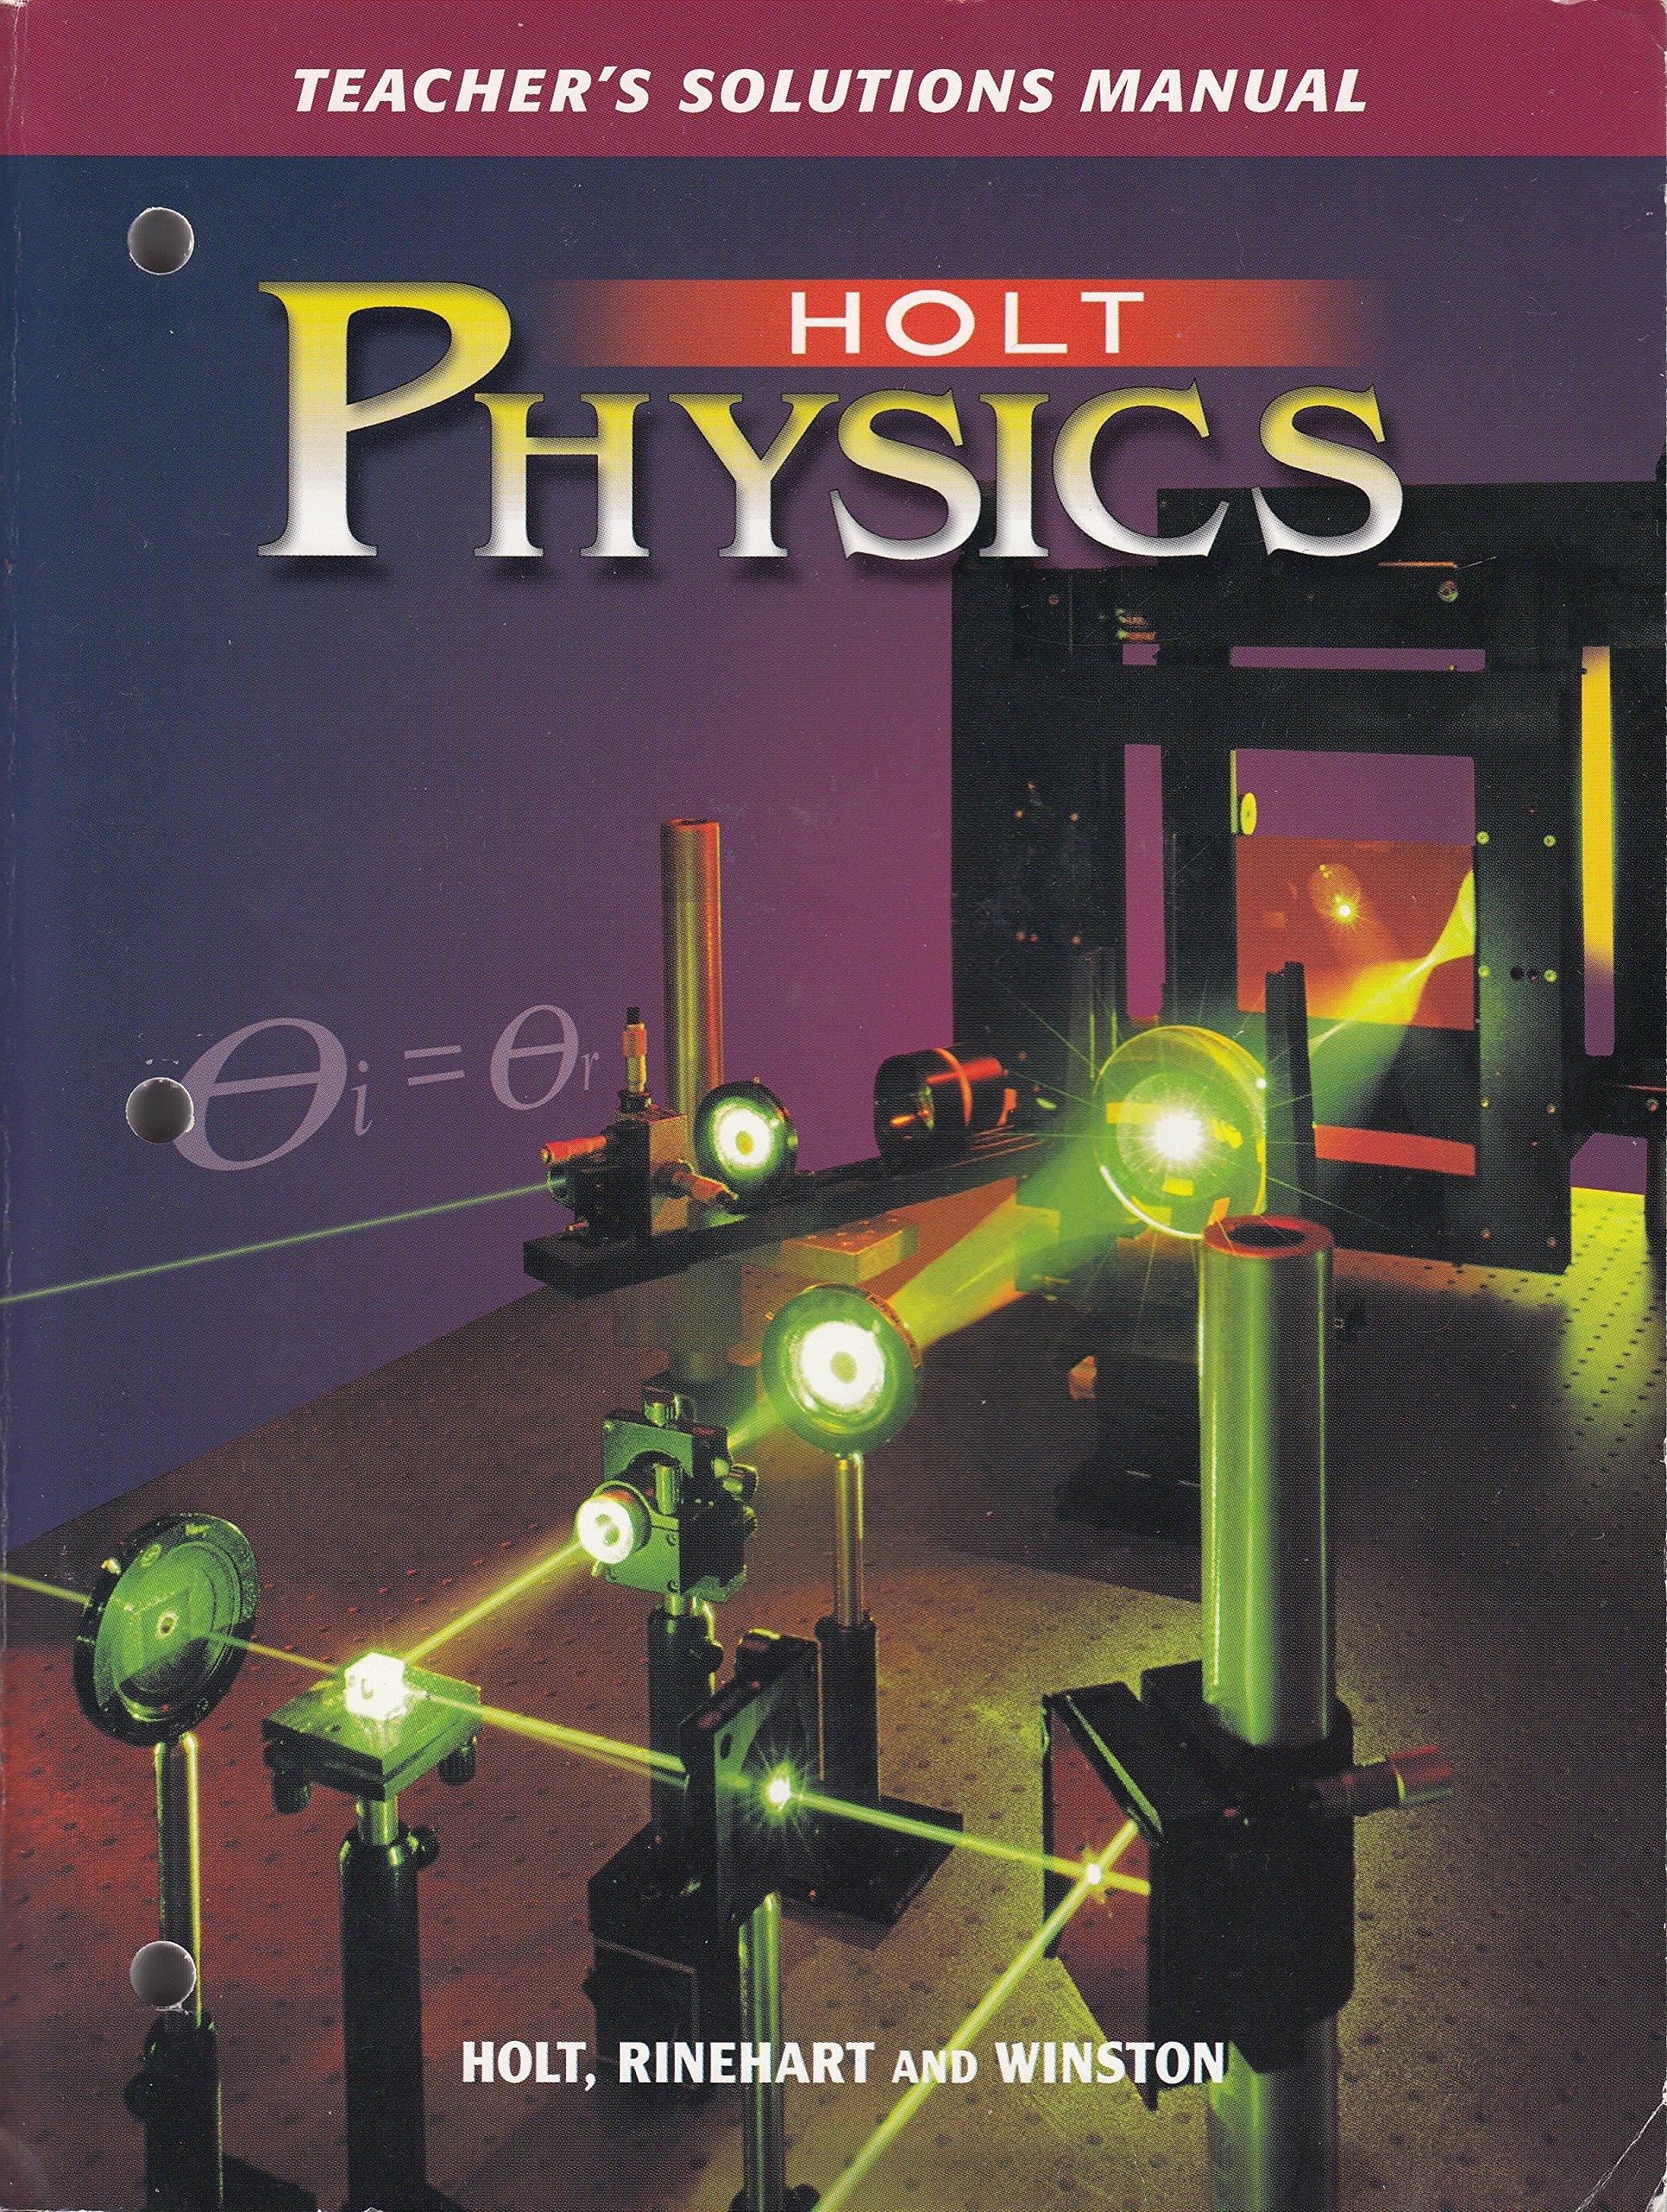 Amazon.com: Holt Physics: Teacher's Solution Manual (9780030684593): Books